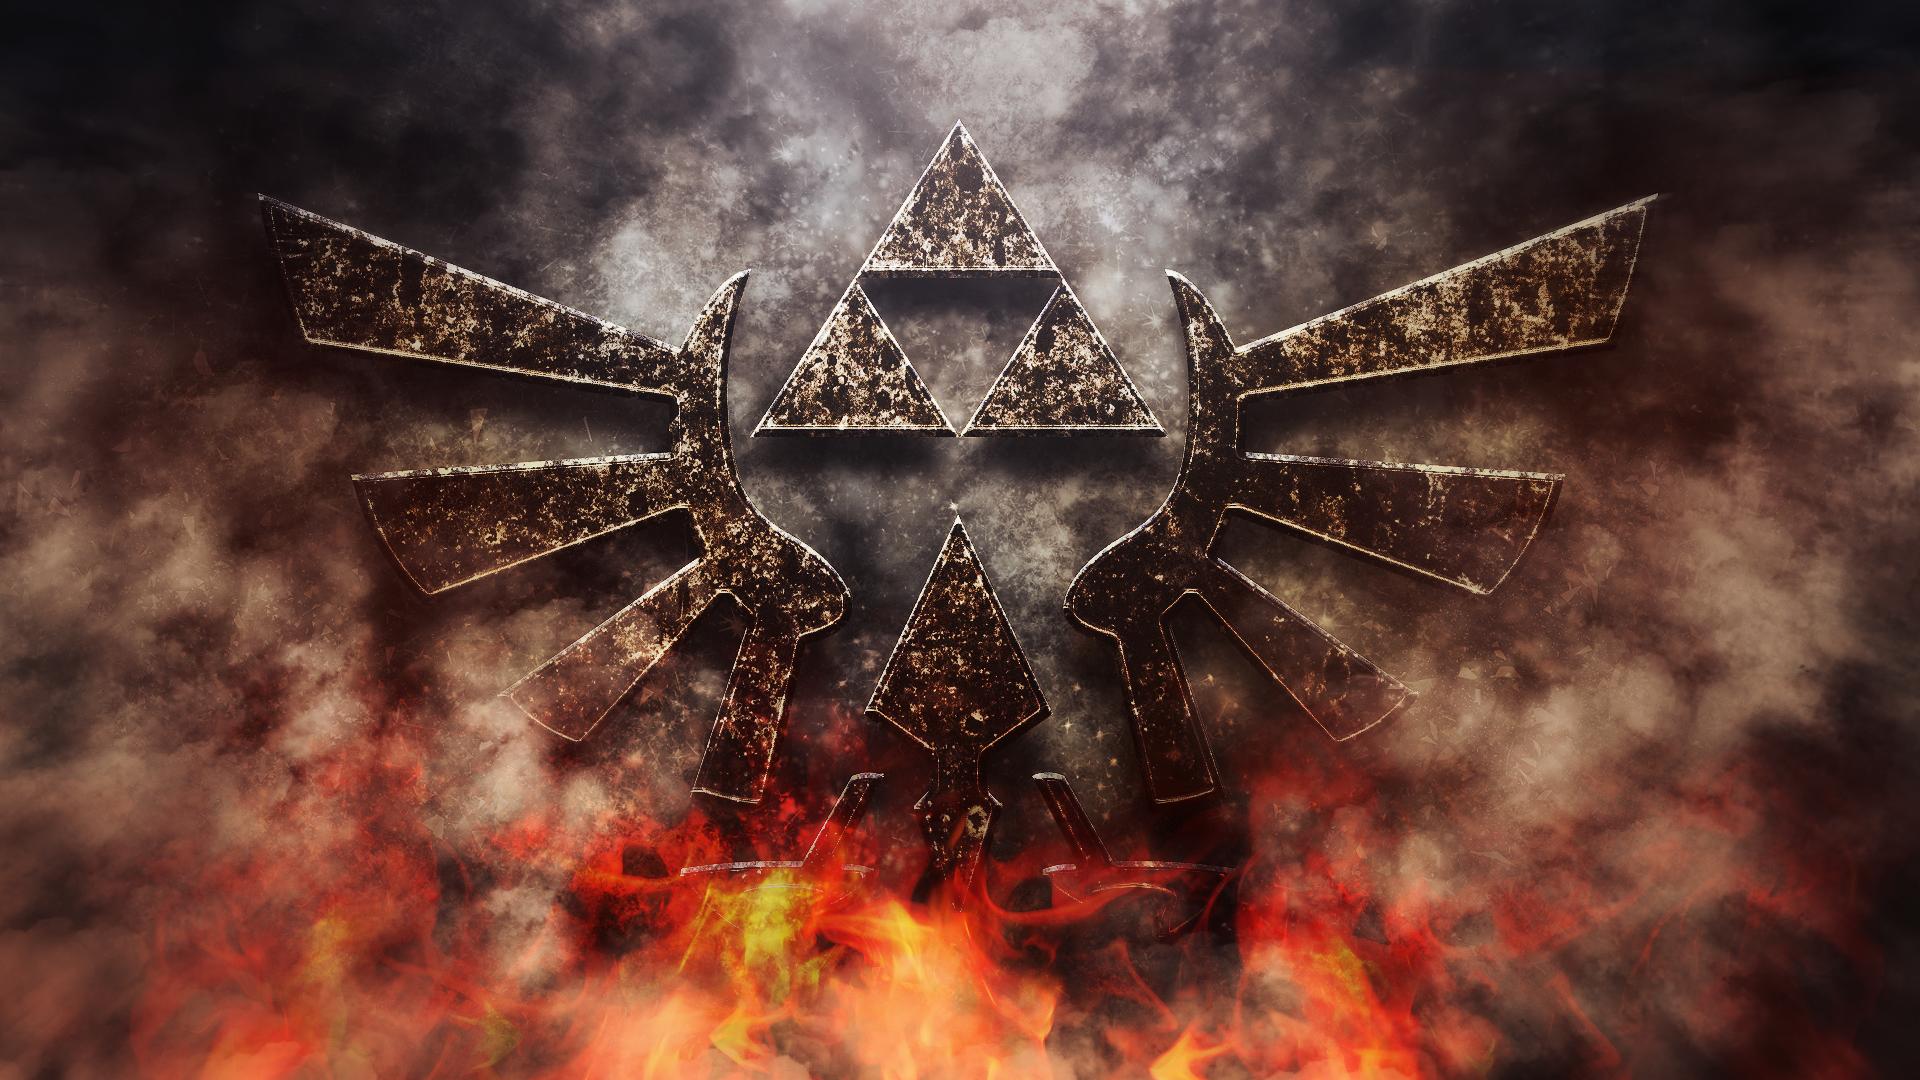 General 1920x1080 hylian crest video game art digital art fire video games Triforce The Legend of Zelda